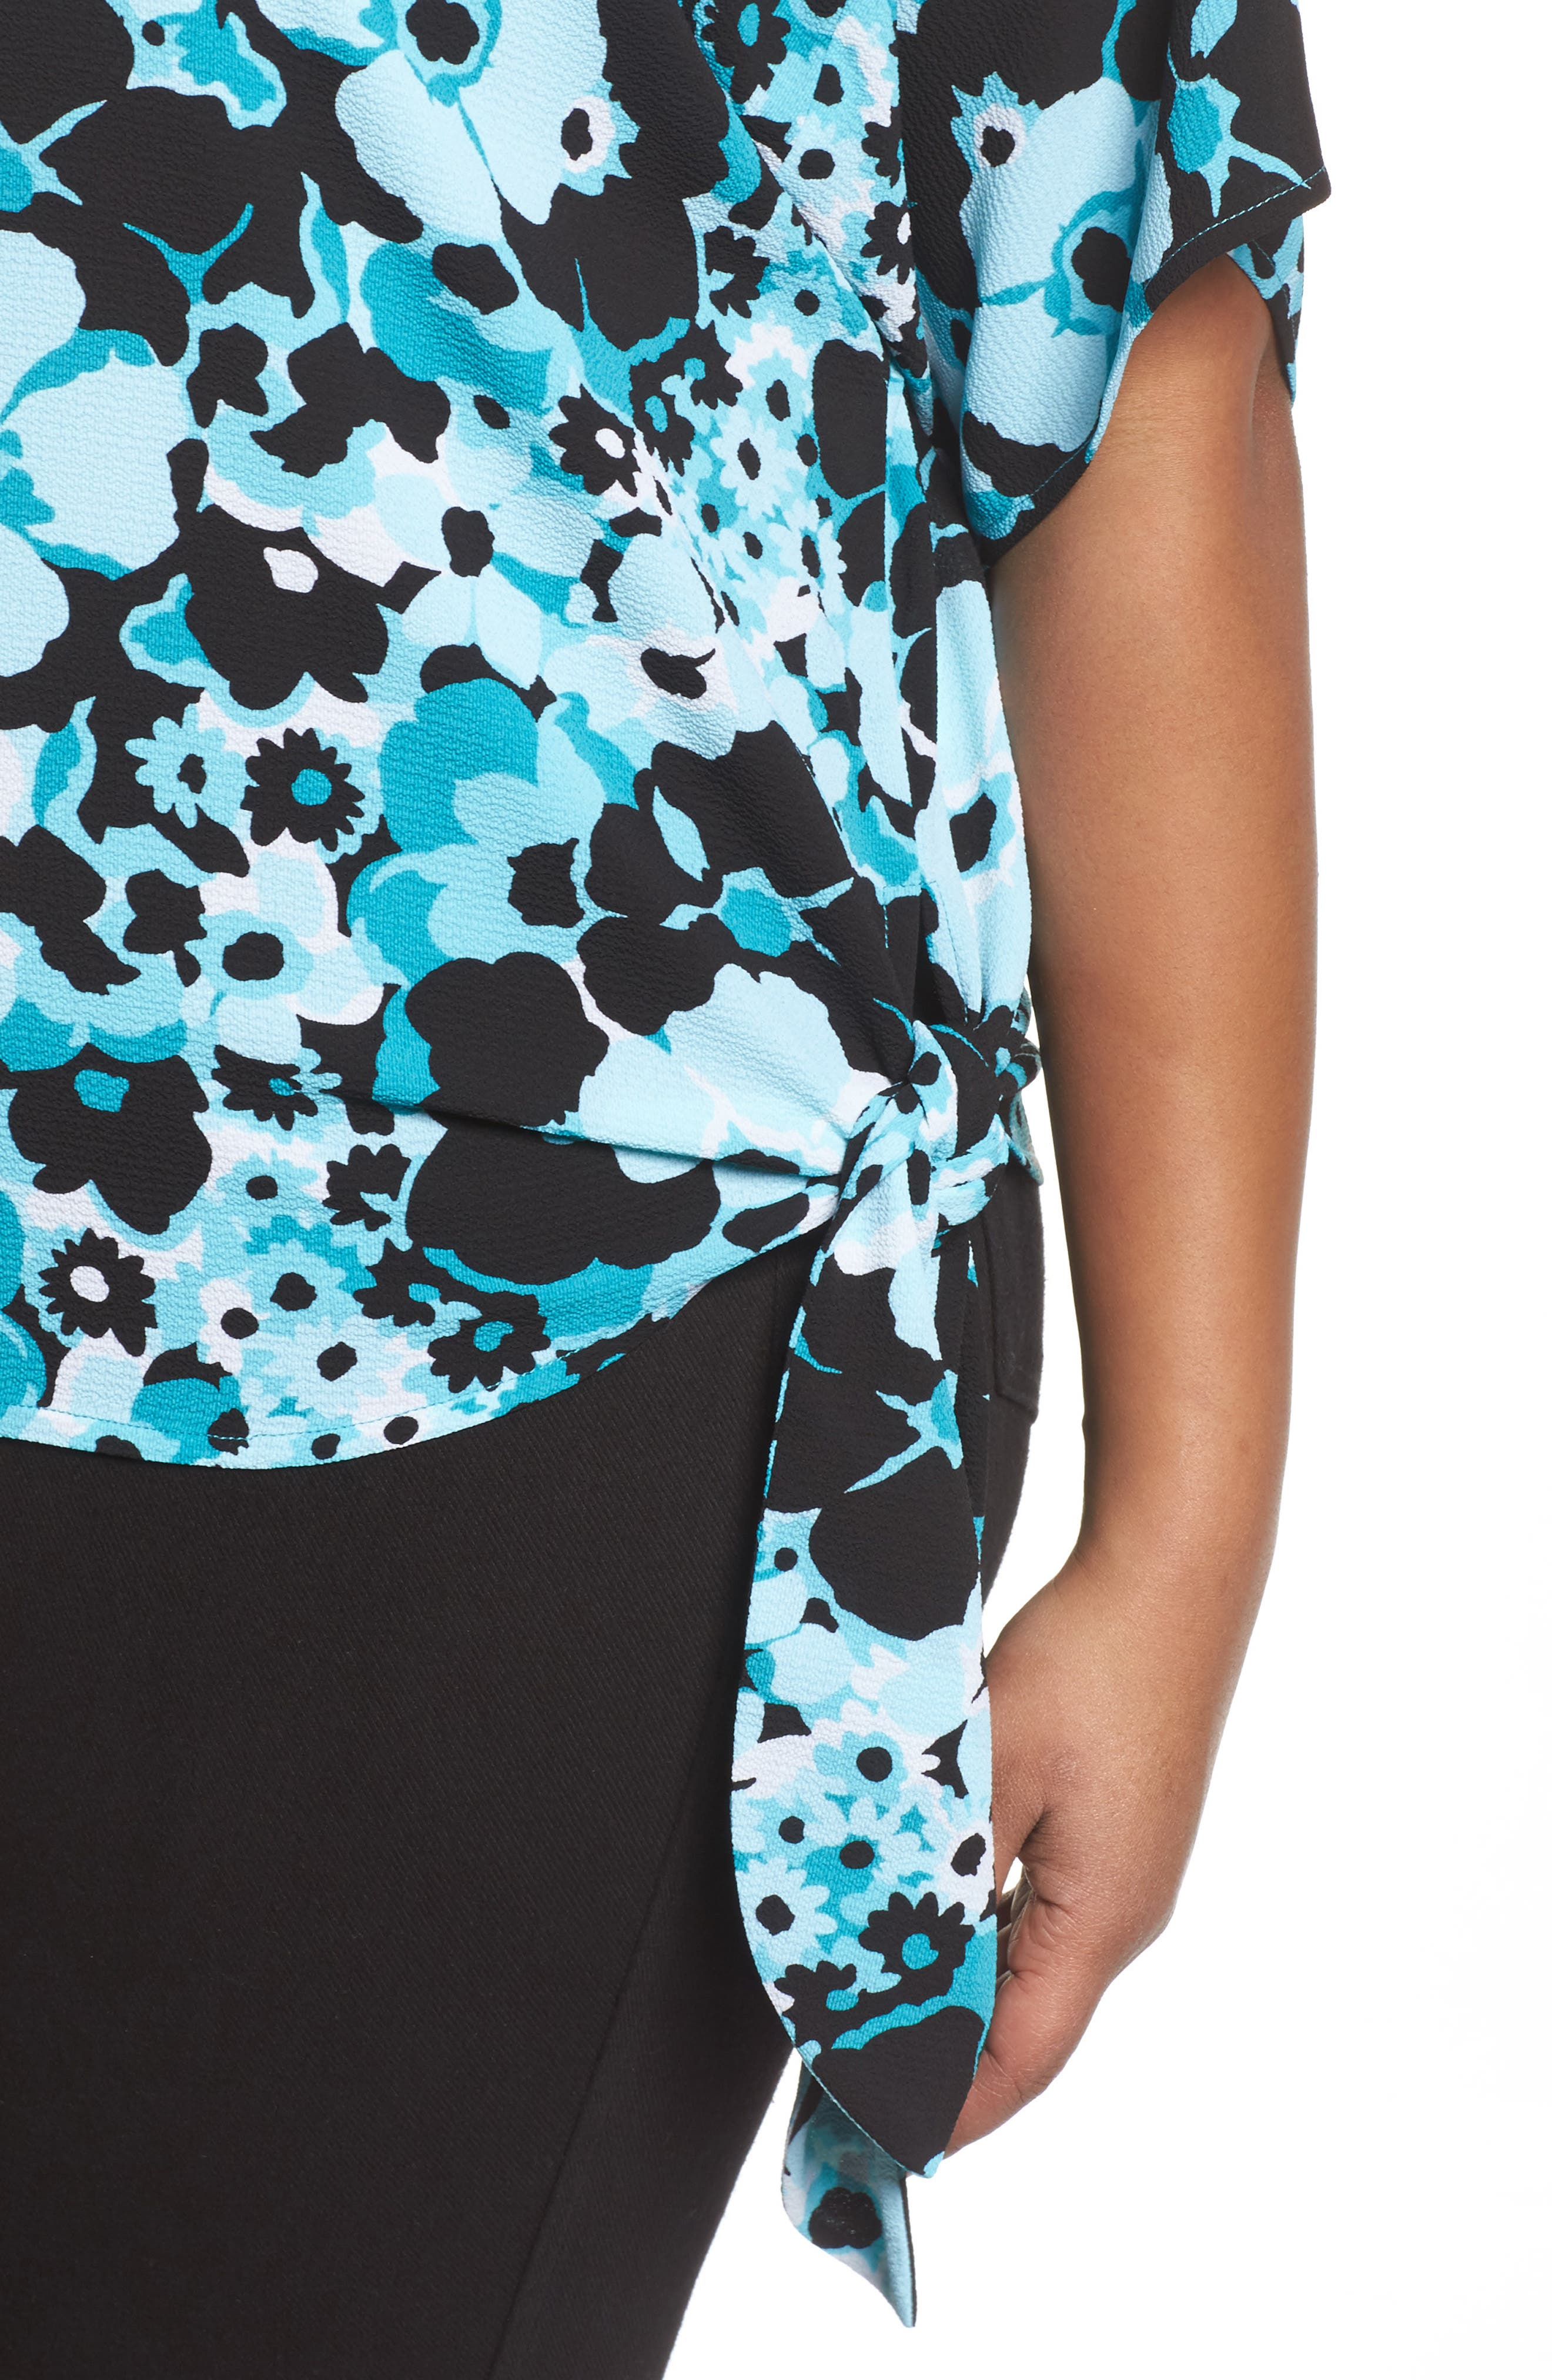 Spring Side Tie Crepe Top,                             Alternate thumbnail 4, color,                             Tile Blue/ Black Multi